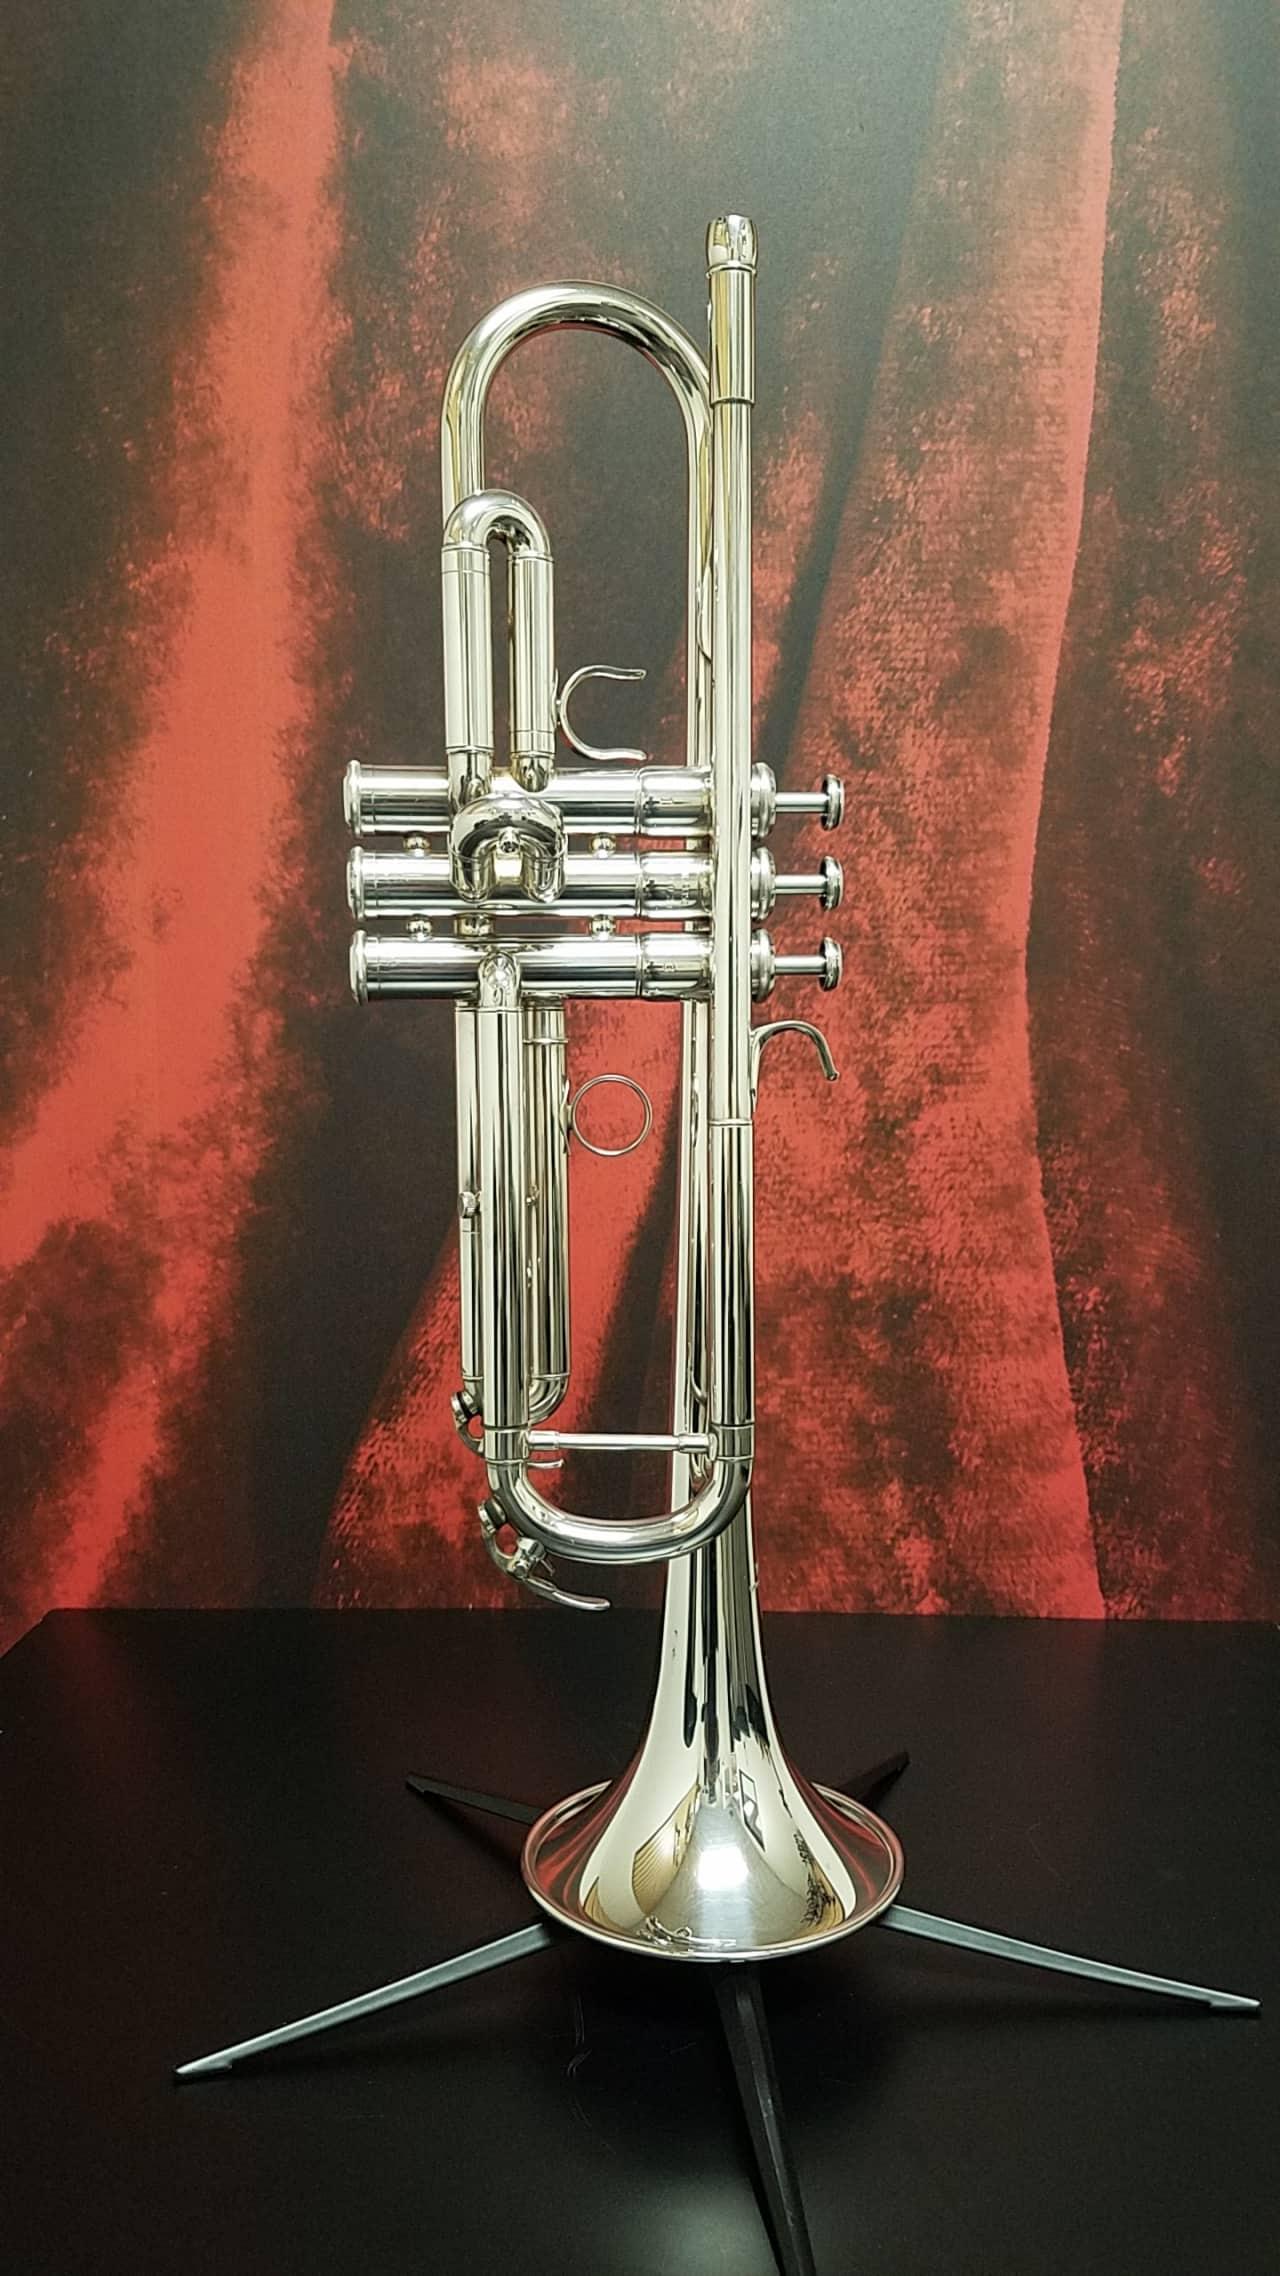 Yamaha ytr 4335g yamaha intermediate pro bb trumpet reverb for Yamaha ytr 4335gs ii